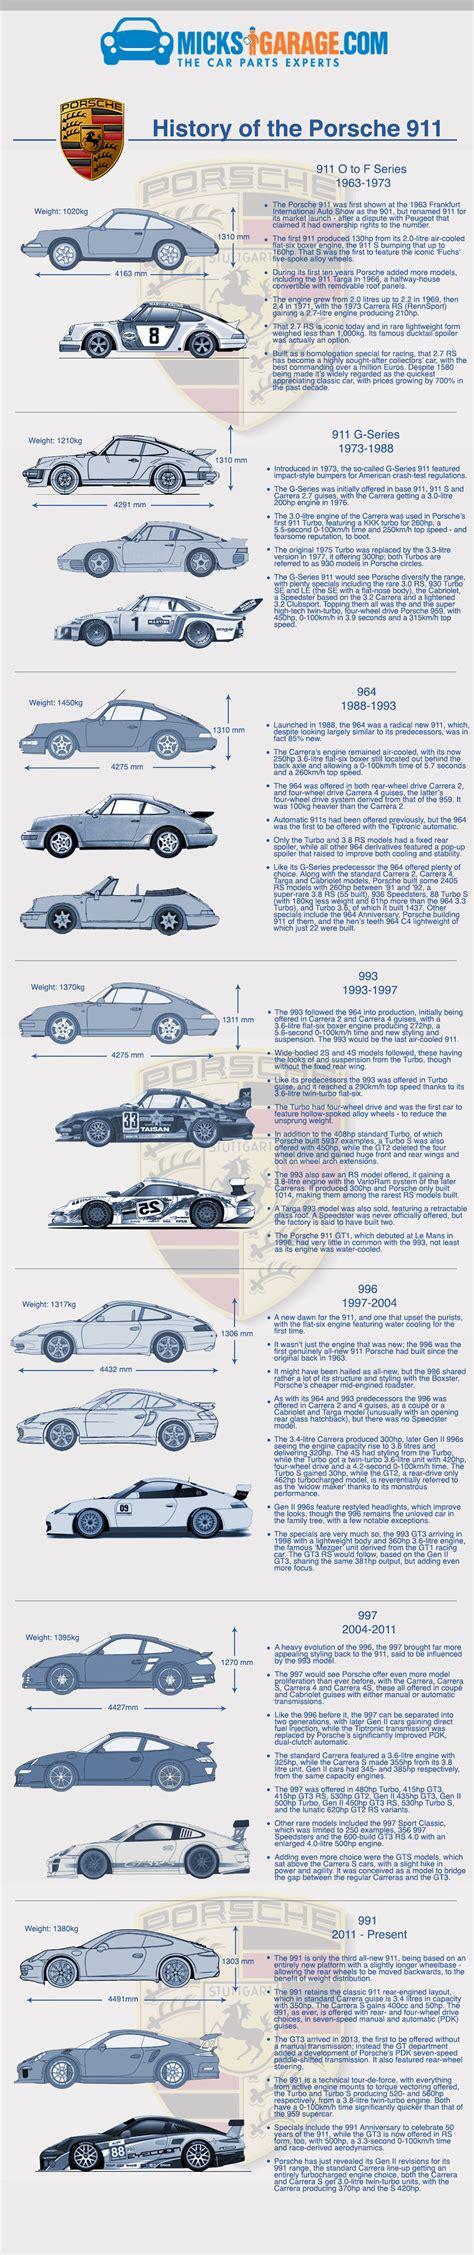 history of porsche infographic history of the porsche 911 micksgarage